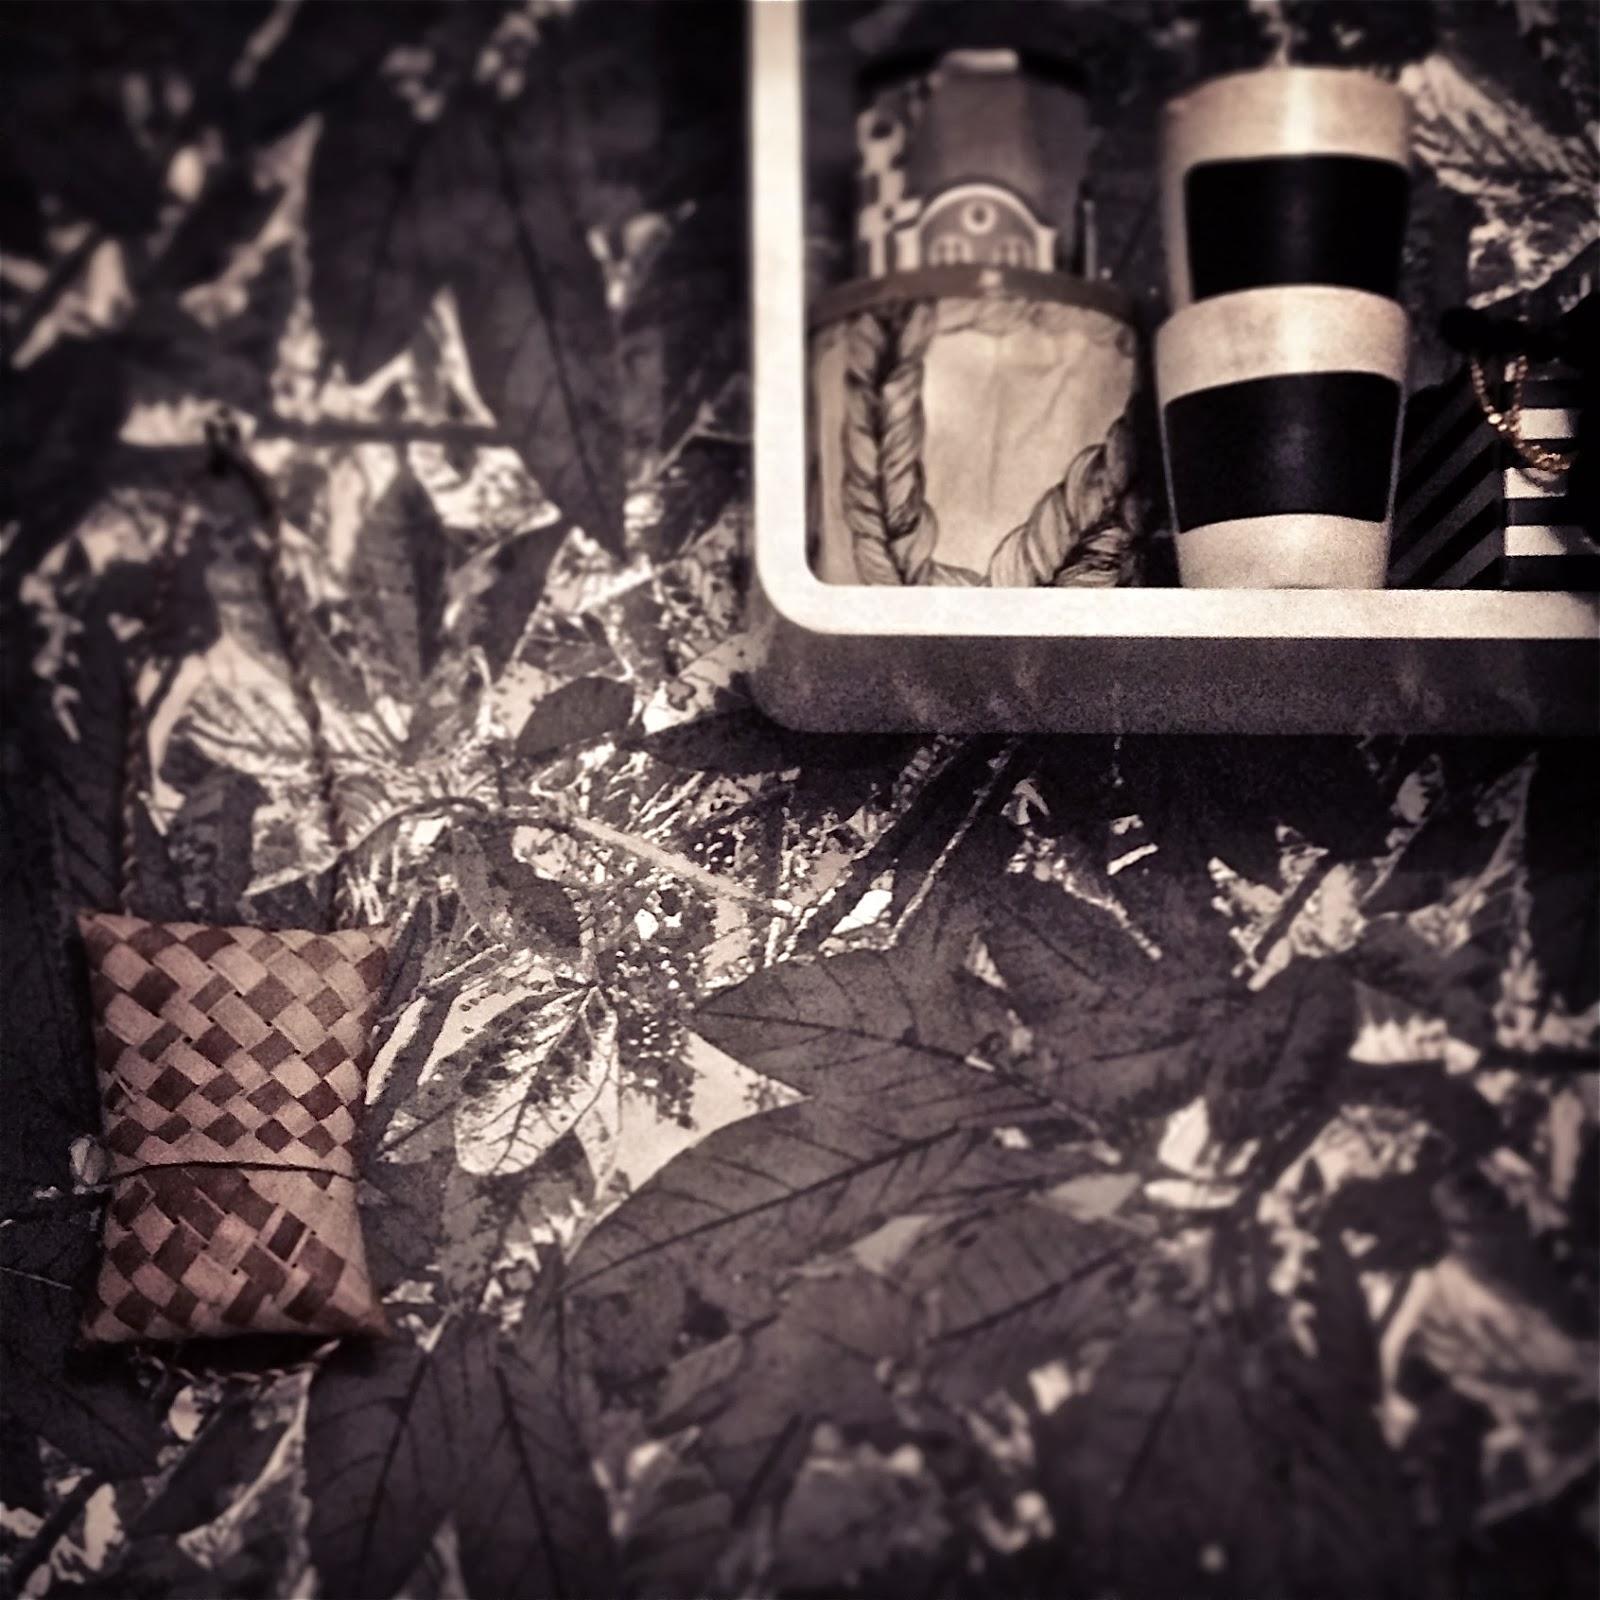 Tuohi laukku, Näver väska, Birchbark bag, Olo-huone